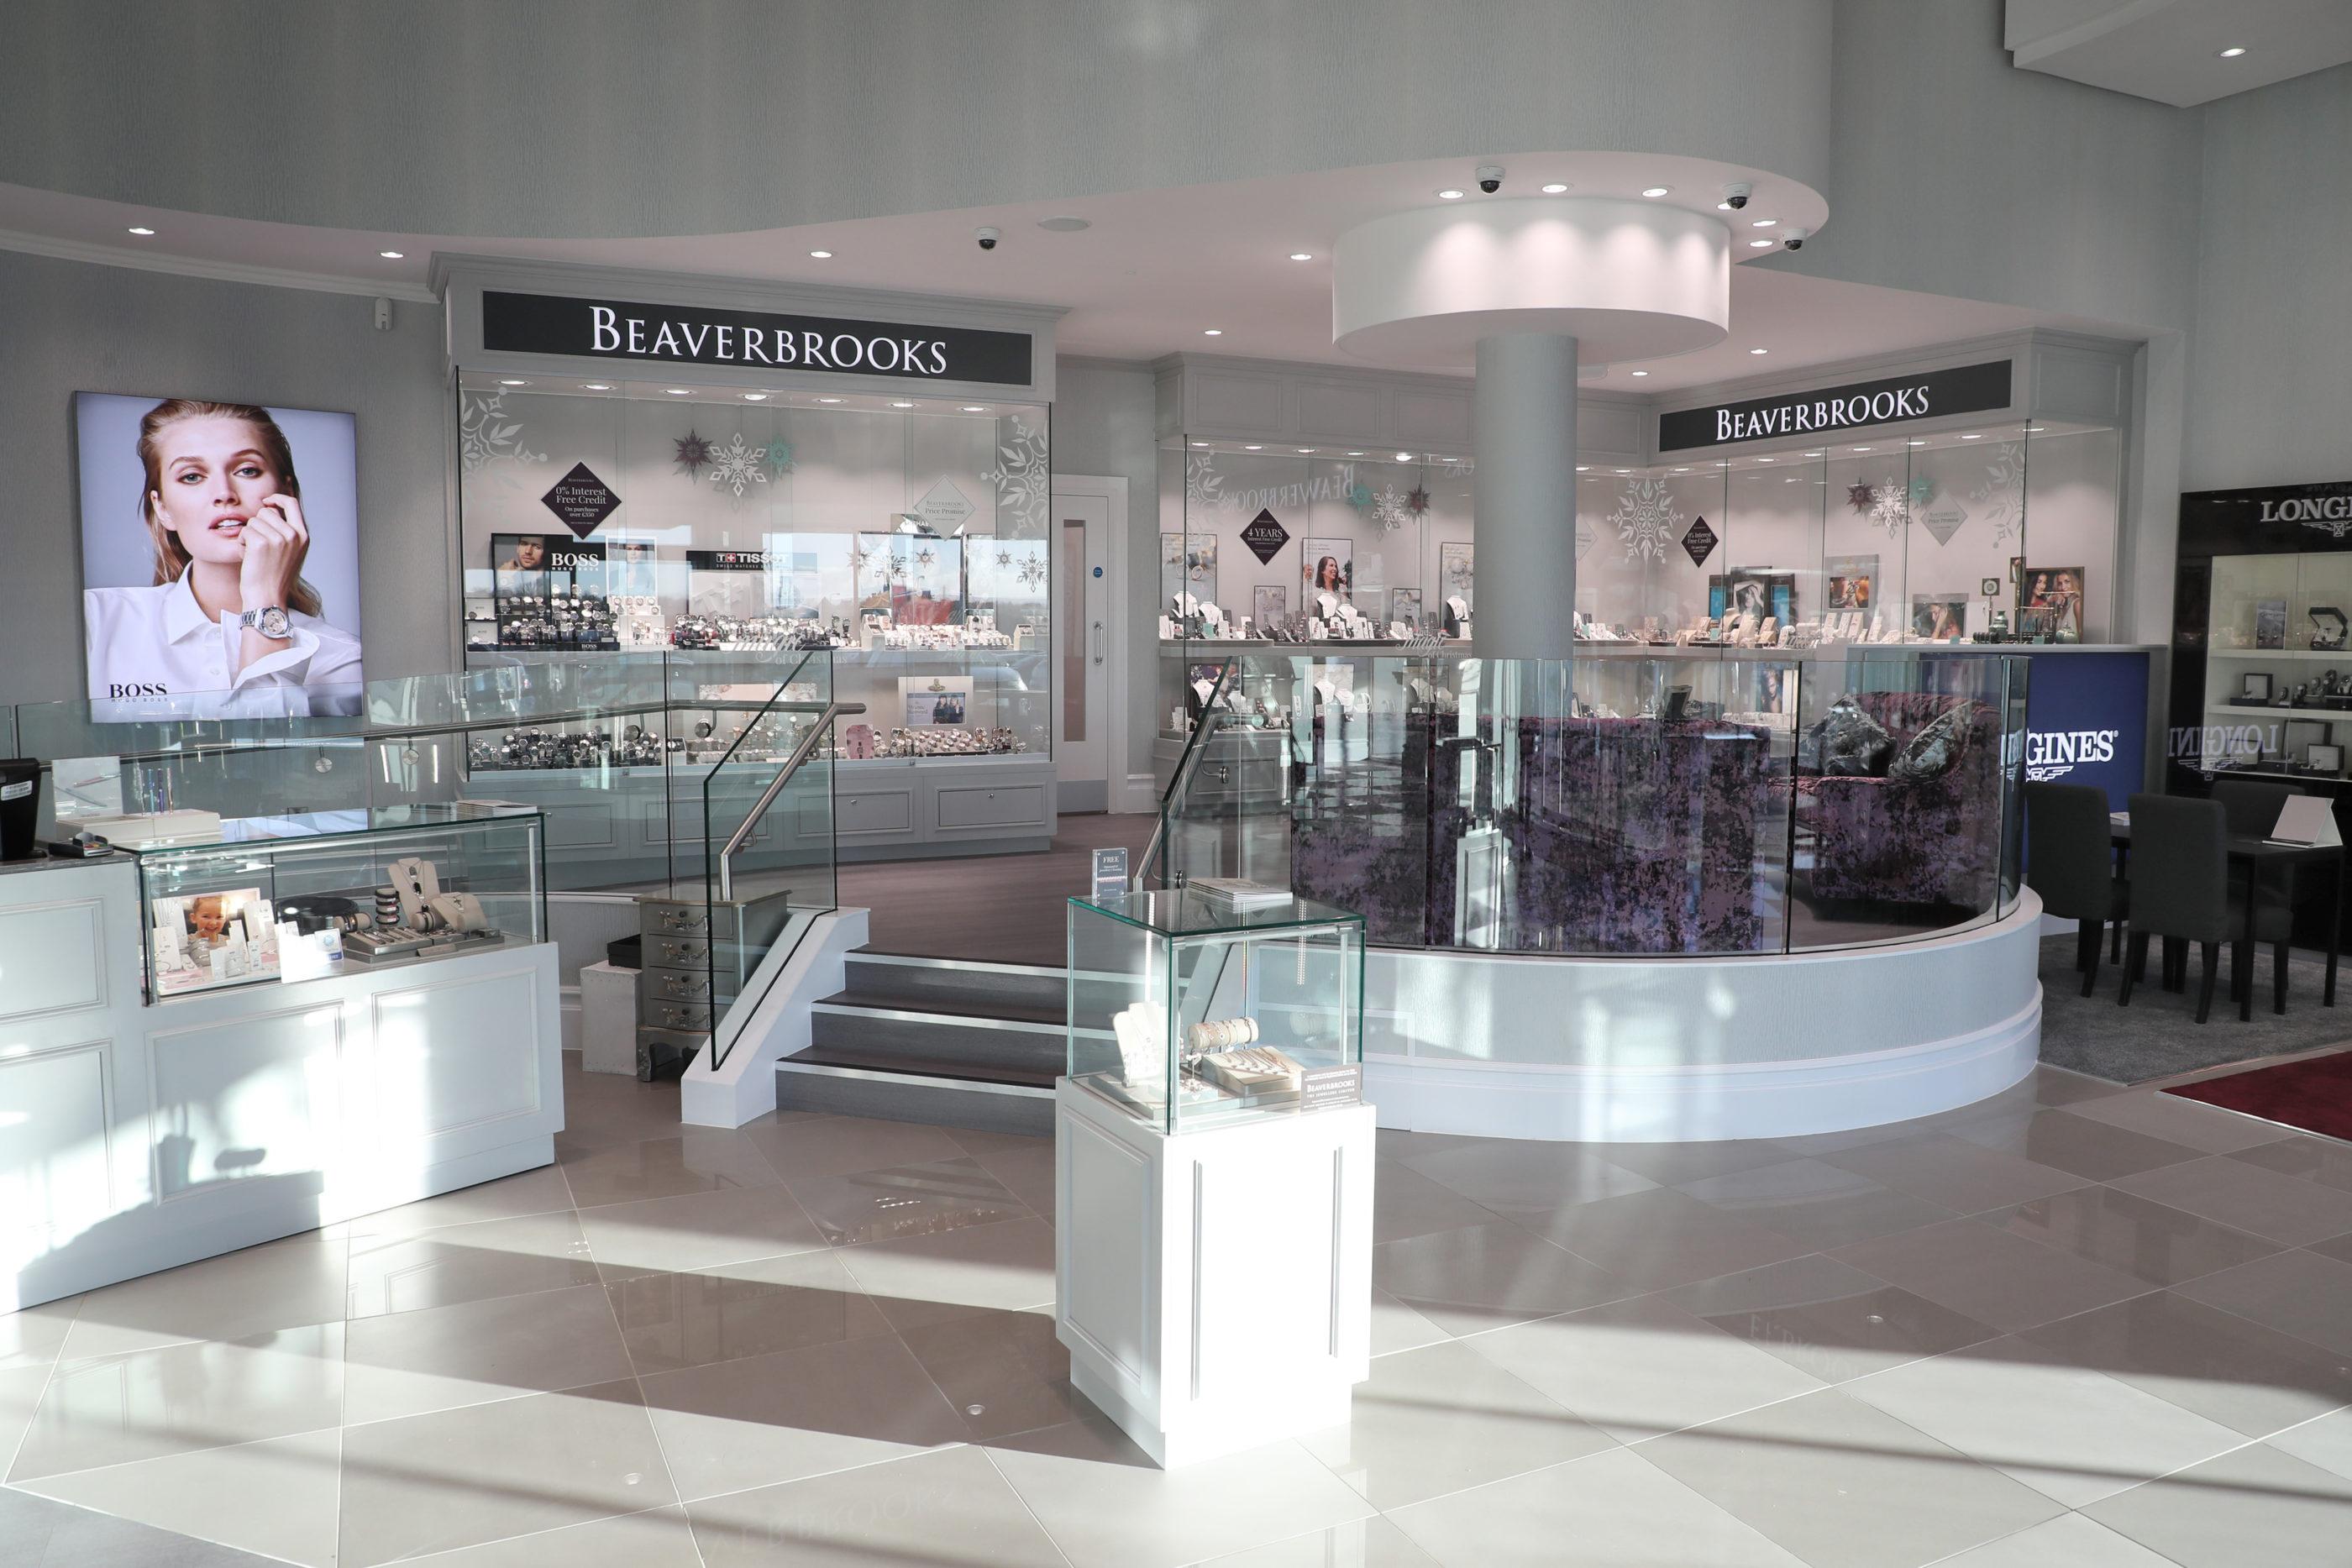 Beaverbrooks-014-a-SA